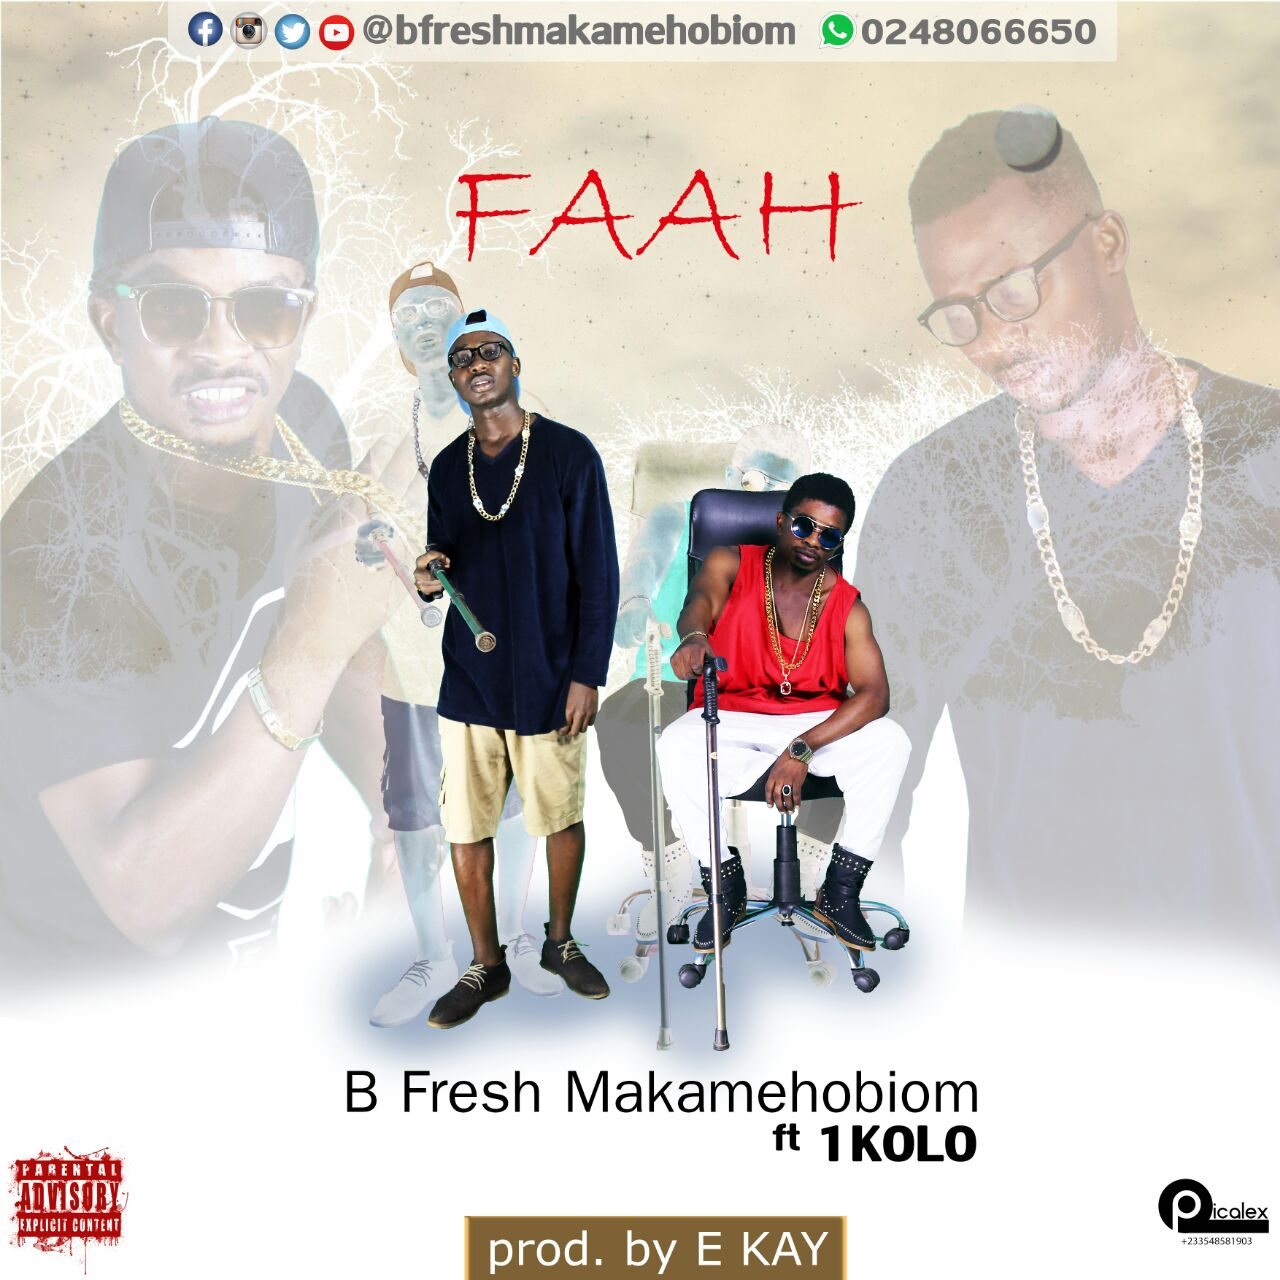 B Fresh FAAH Ft